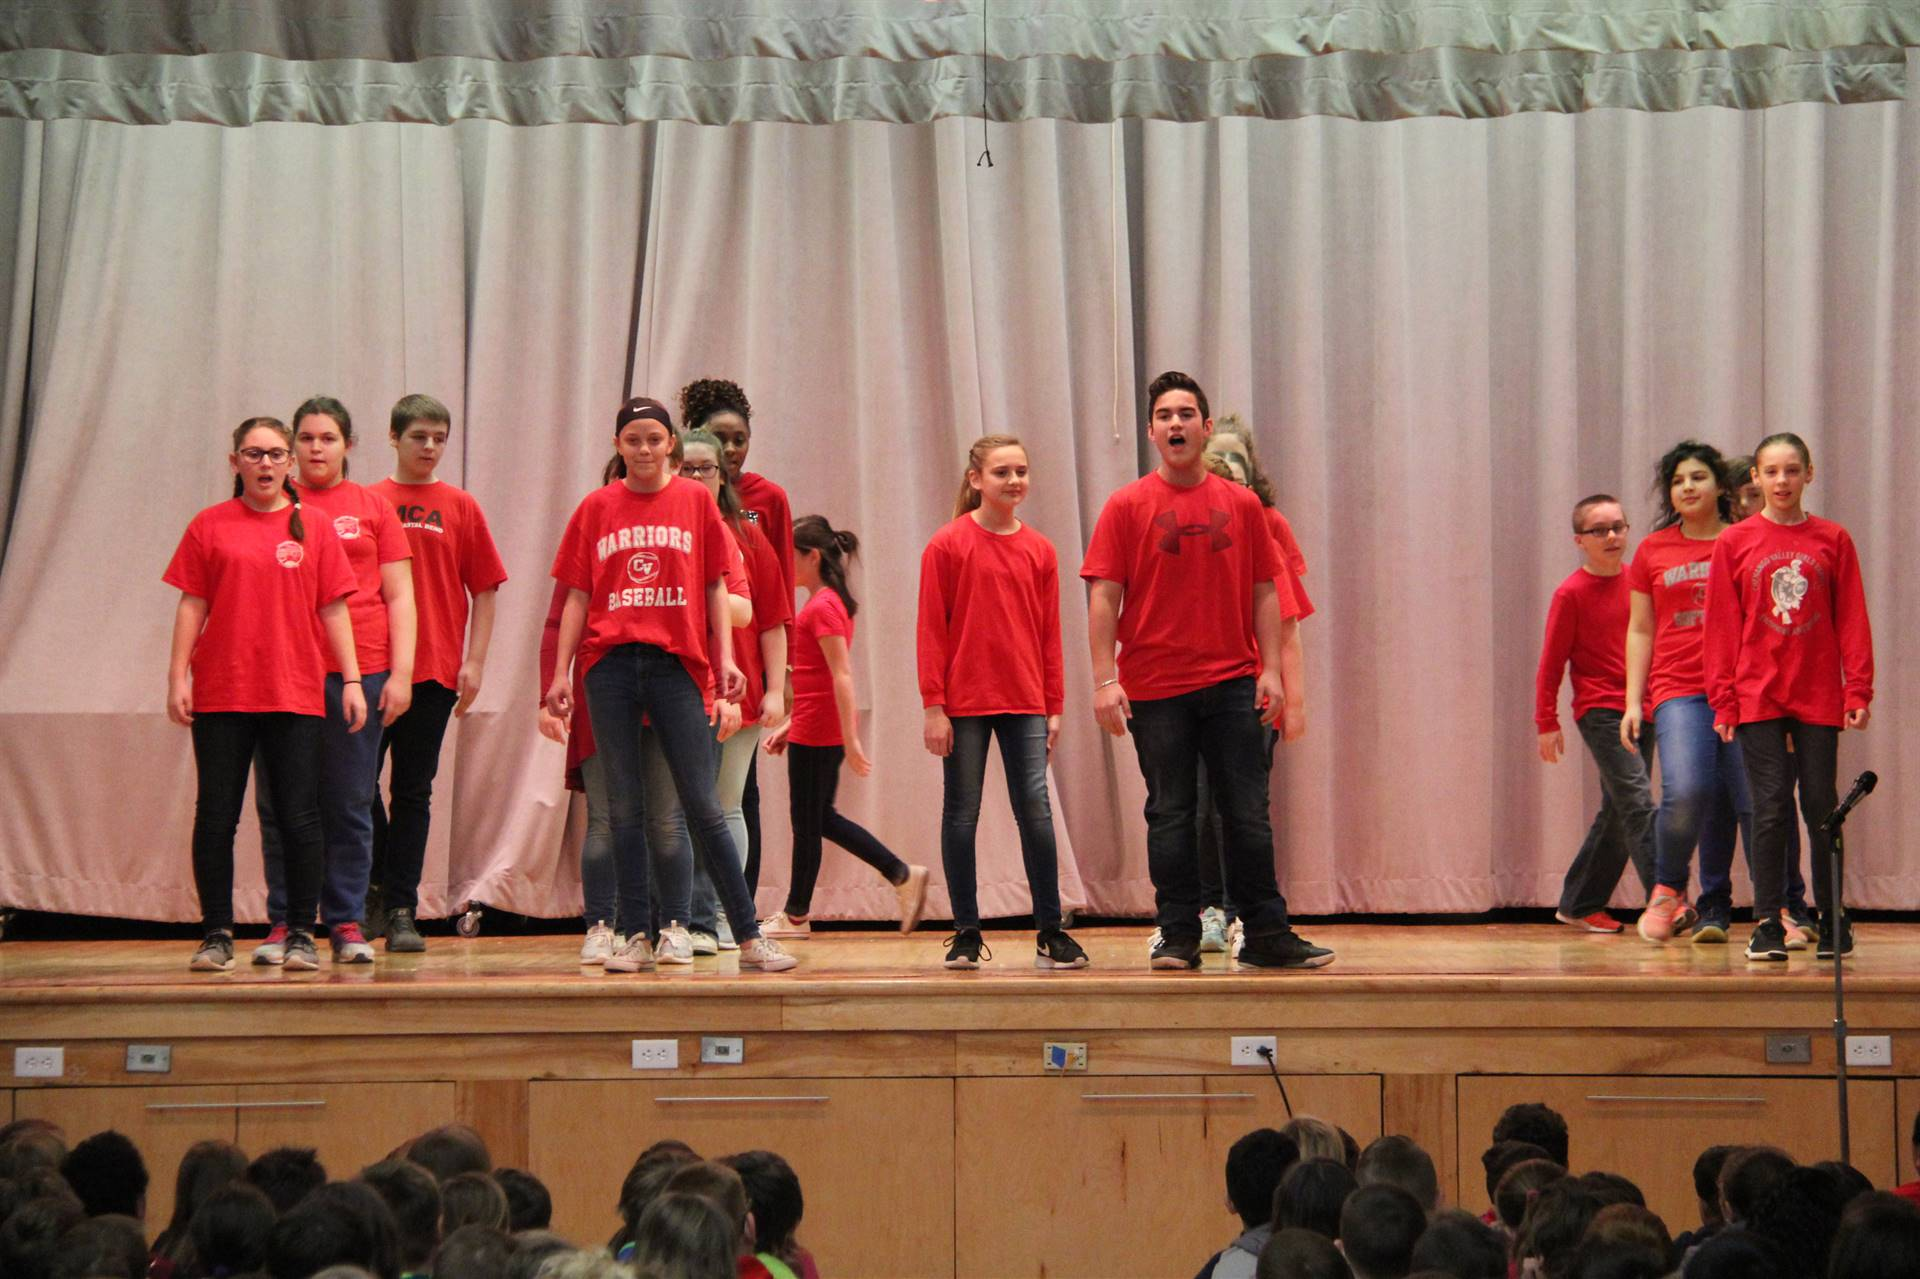 sneak preview performance at chenango bridge elementary 2